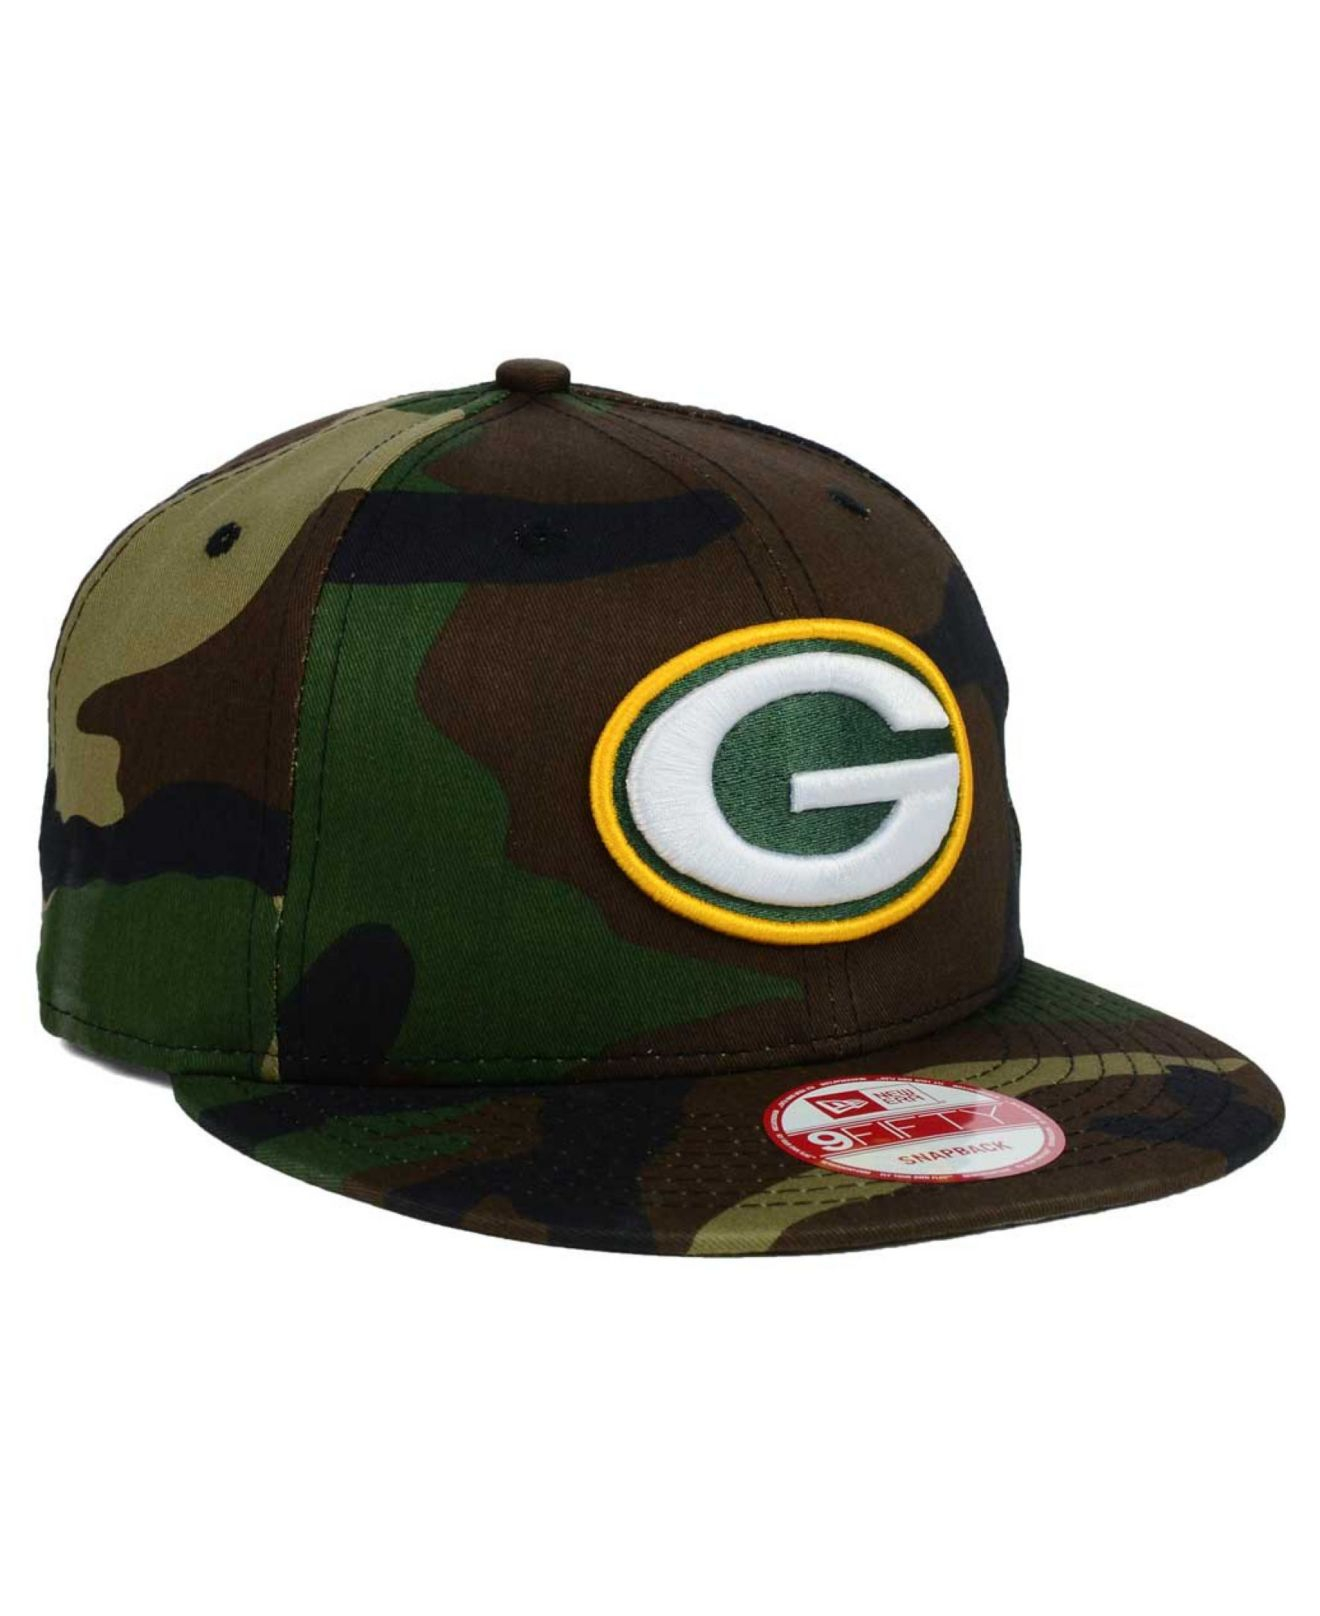 Lyst - KTZ Green Bay Packers Woodland Camo Team Color 9Fifty ... 7abb716c6dbd7